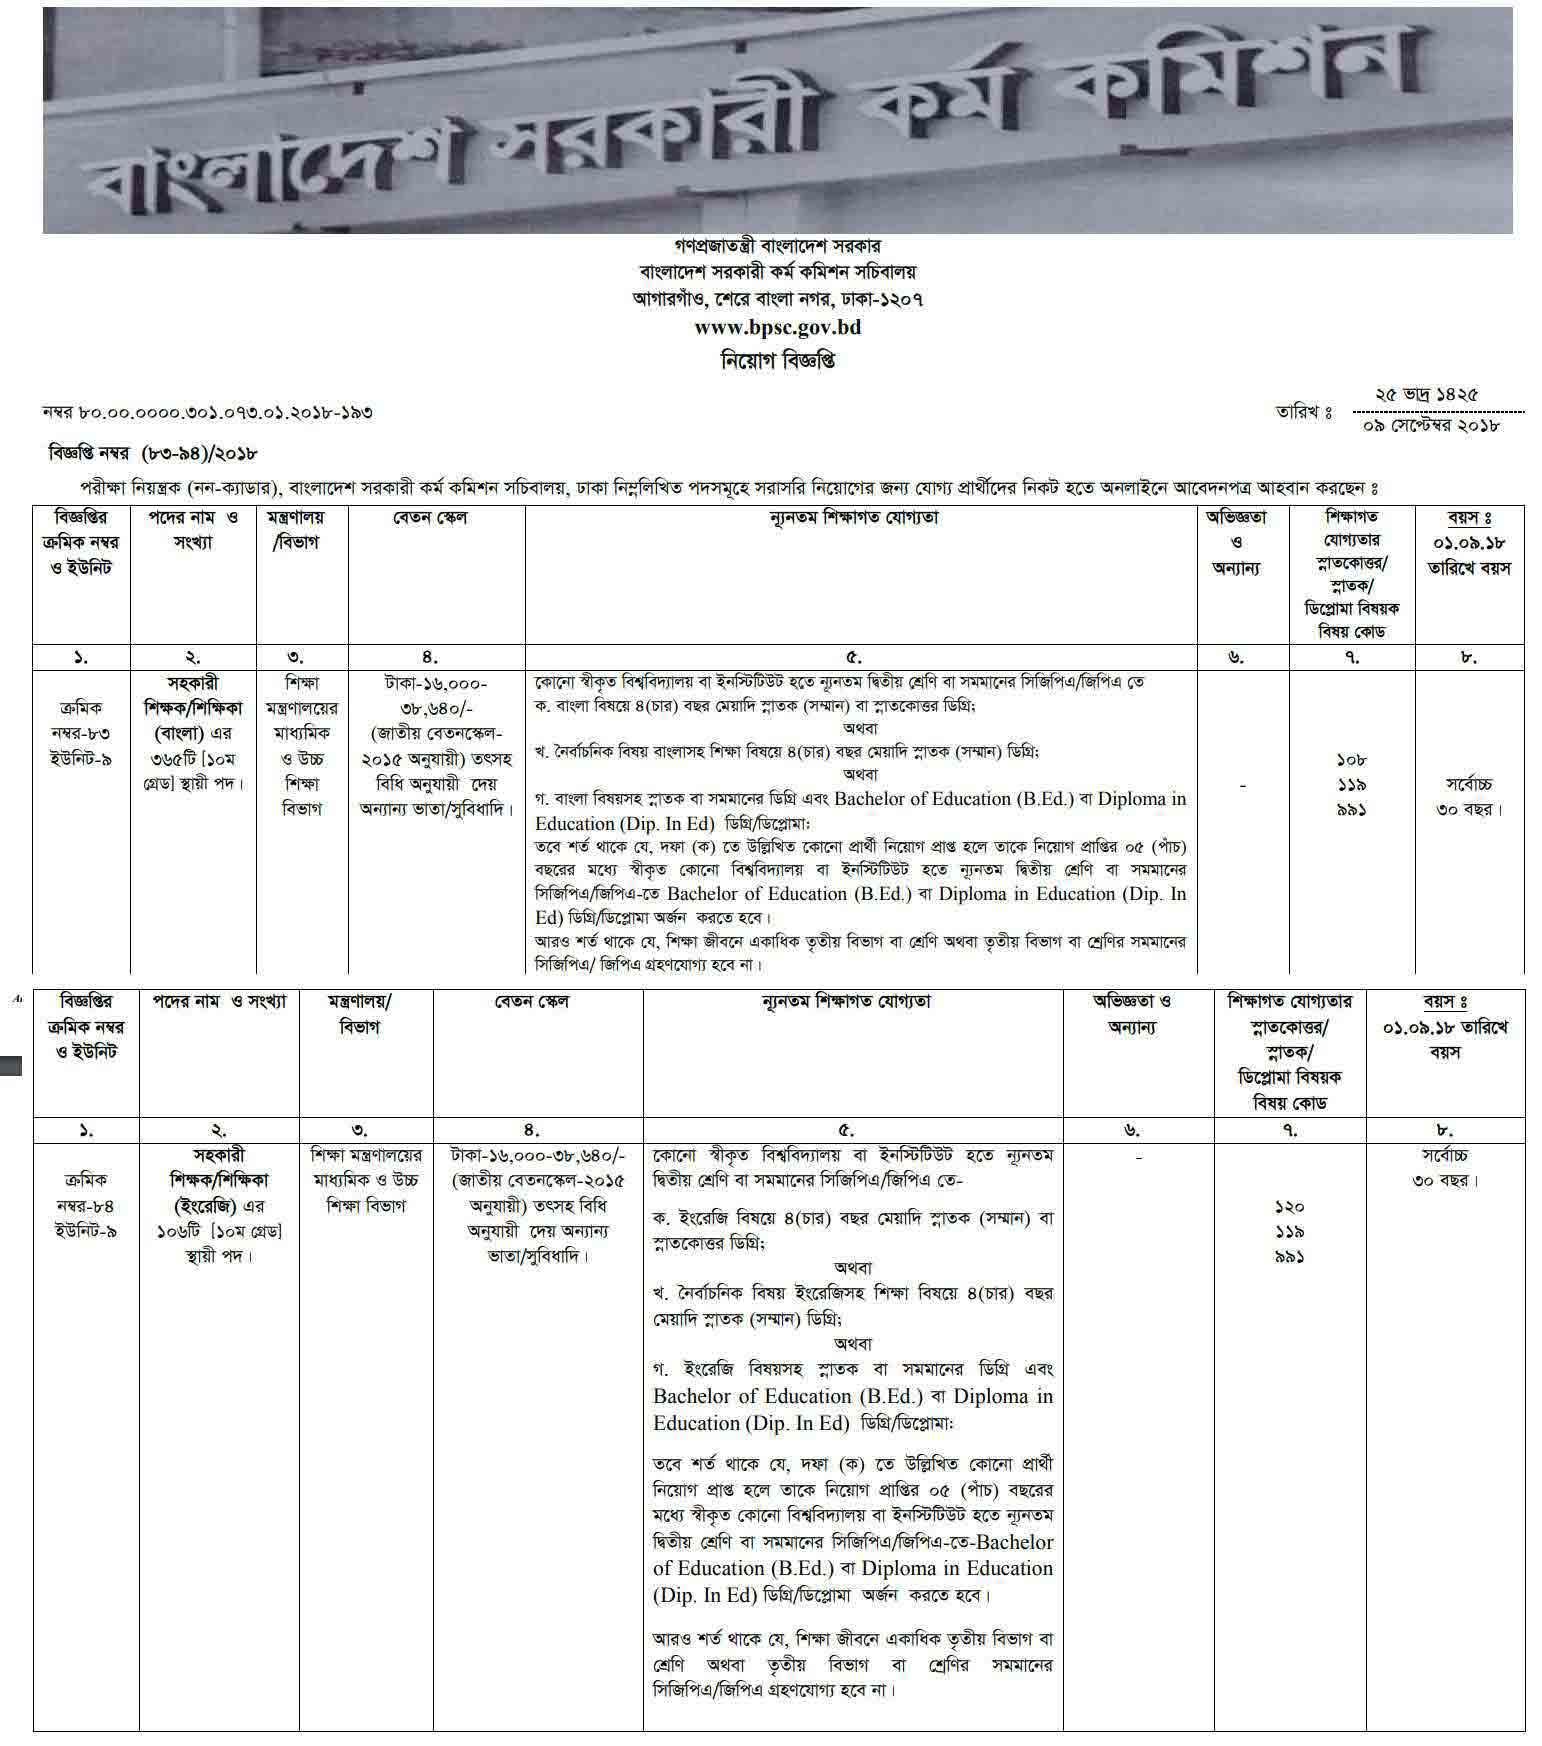 Bangladesh-Public-Service-Commission-BPSC-Job-Circular 2018